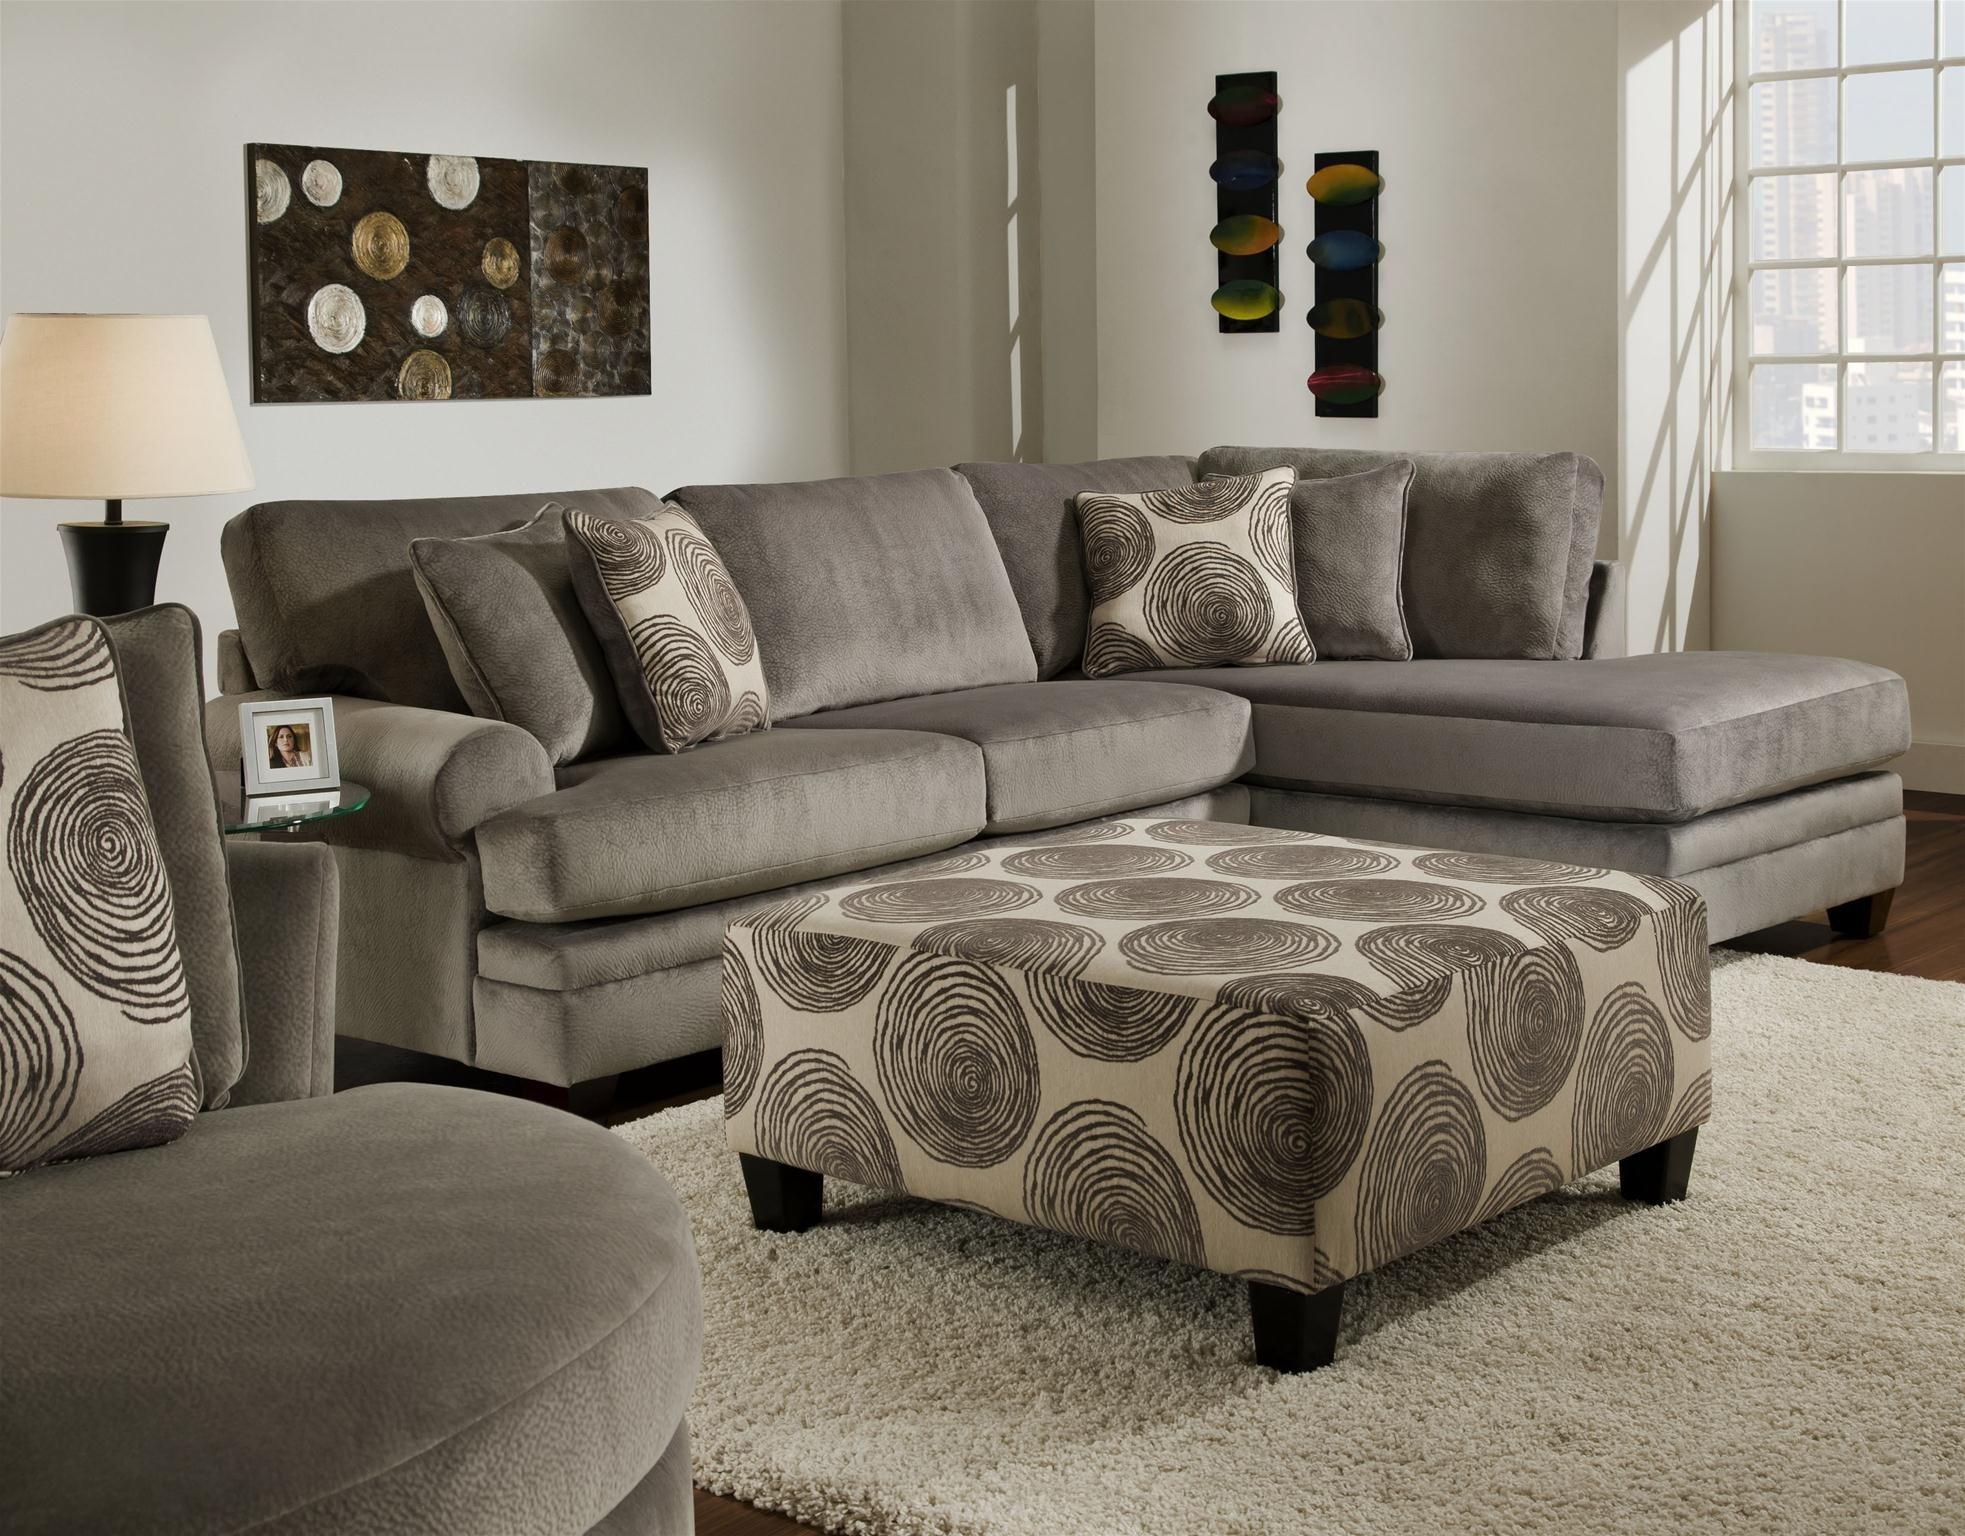 Albany Living Room SWIVEL CHAIR SMOKE 8642 27 SMOKE At Feceras Furniture U0026  Mattress